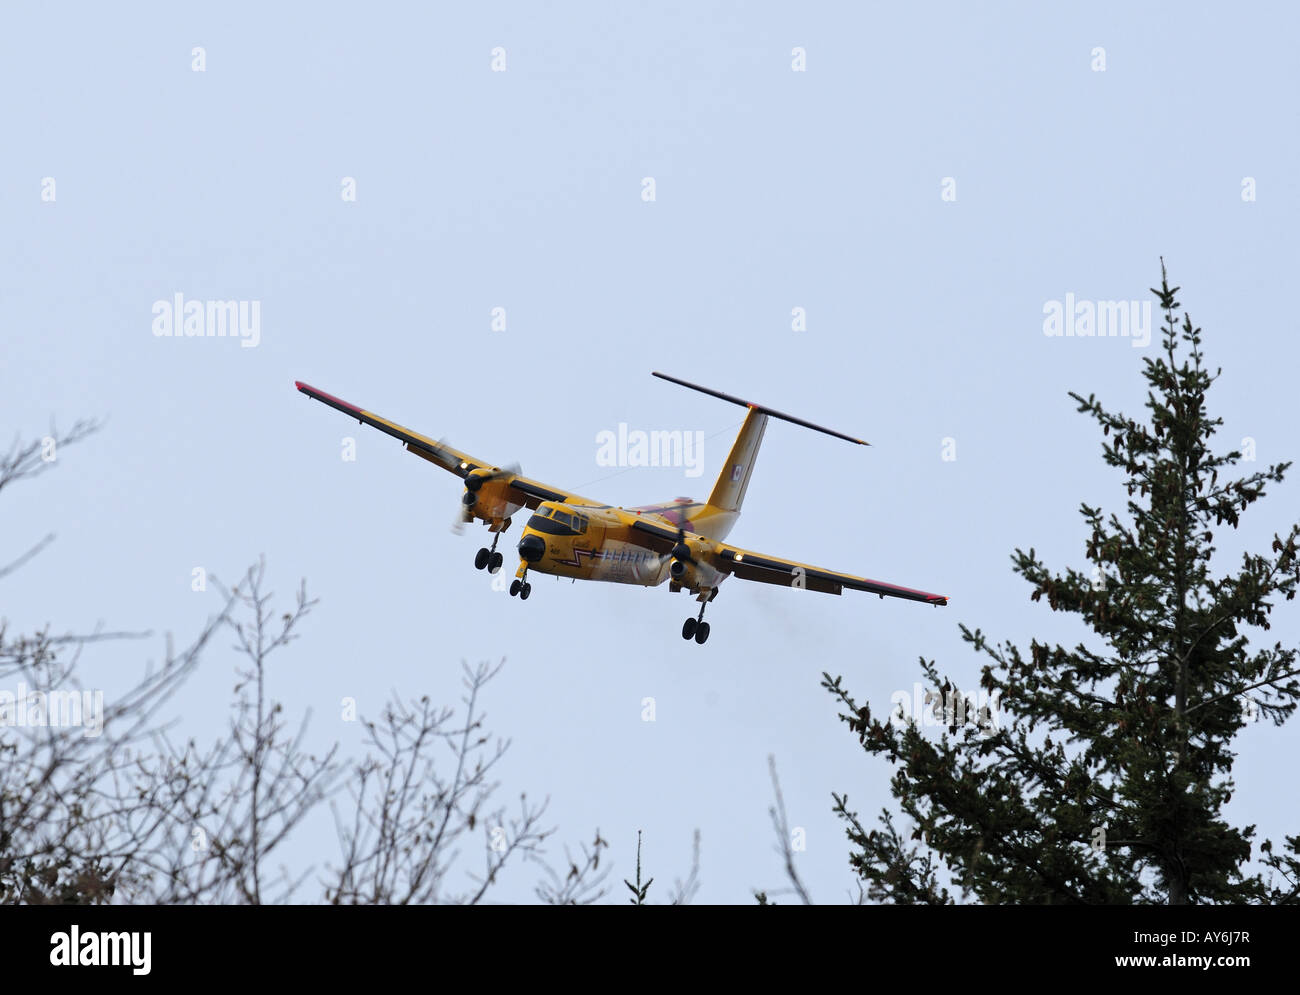 115465 DeHaviland Buffalo approaching Comox 19 wing Airfield. - Stock Image